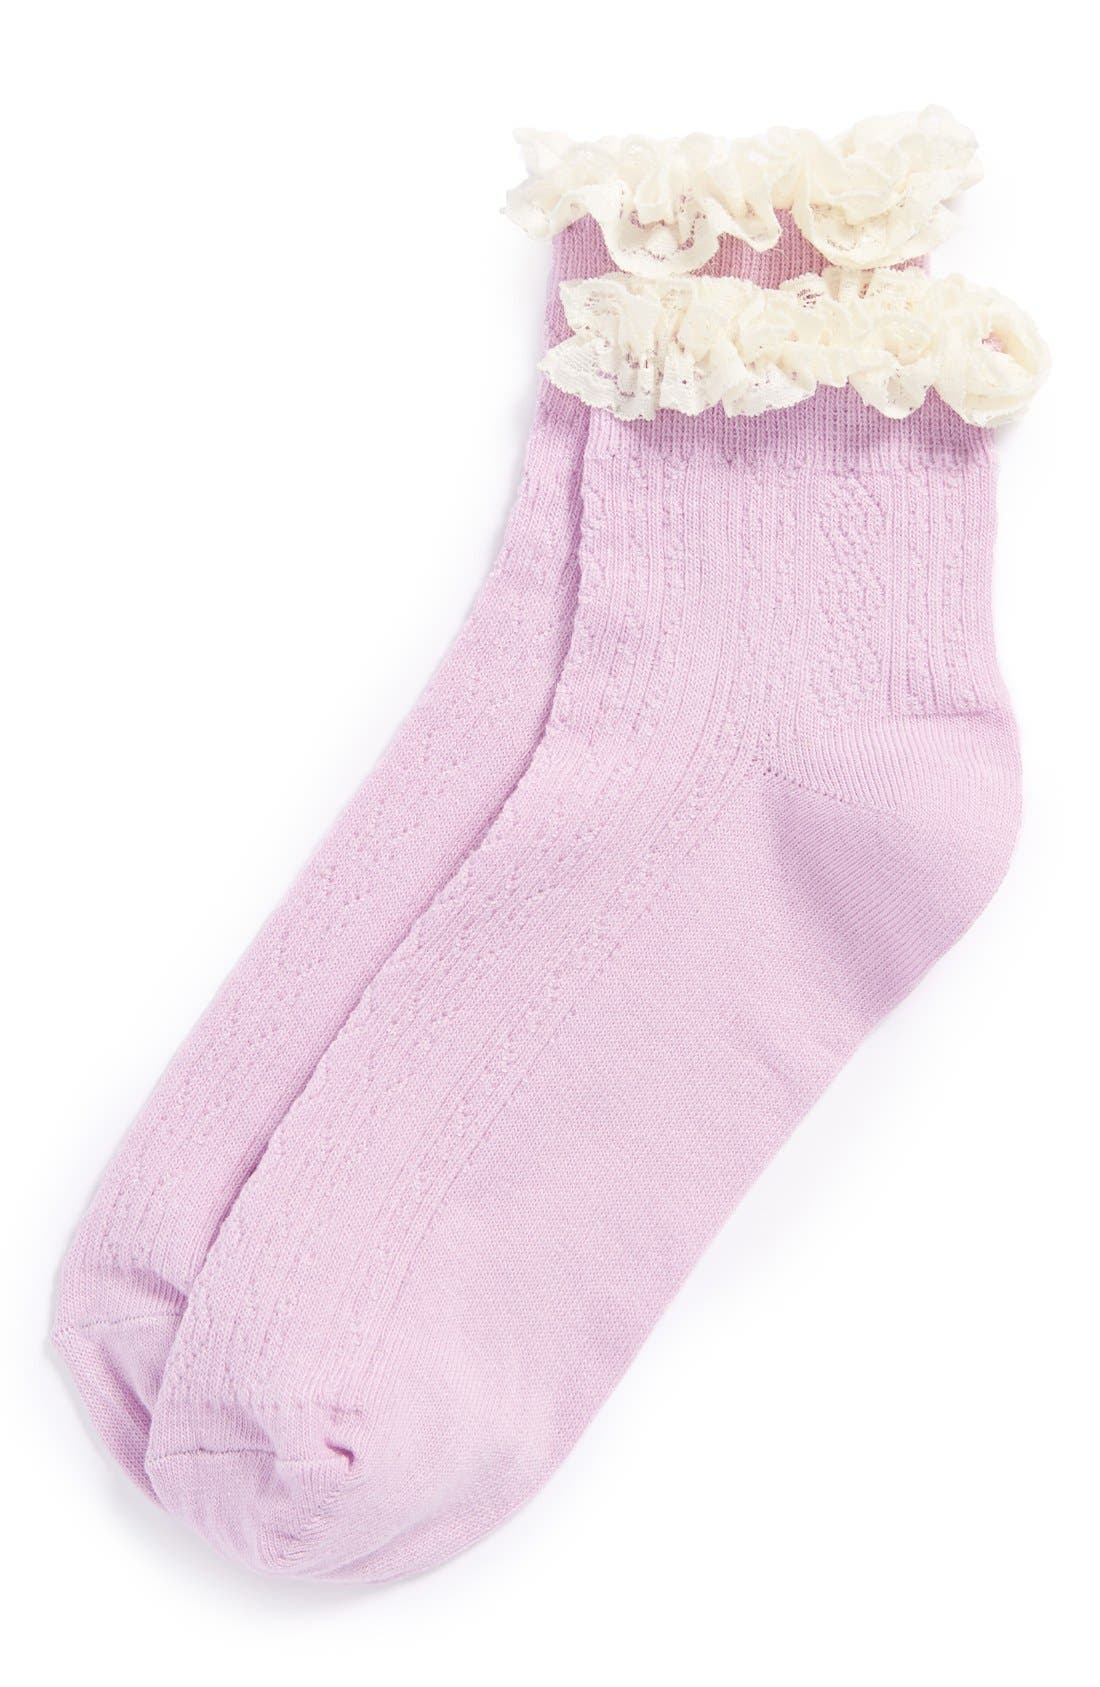 Main Image - Topshop Crocheted Lace Socks